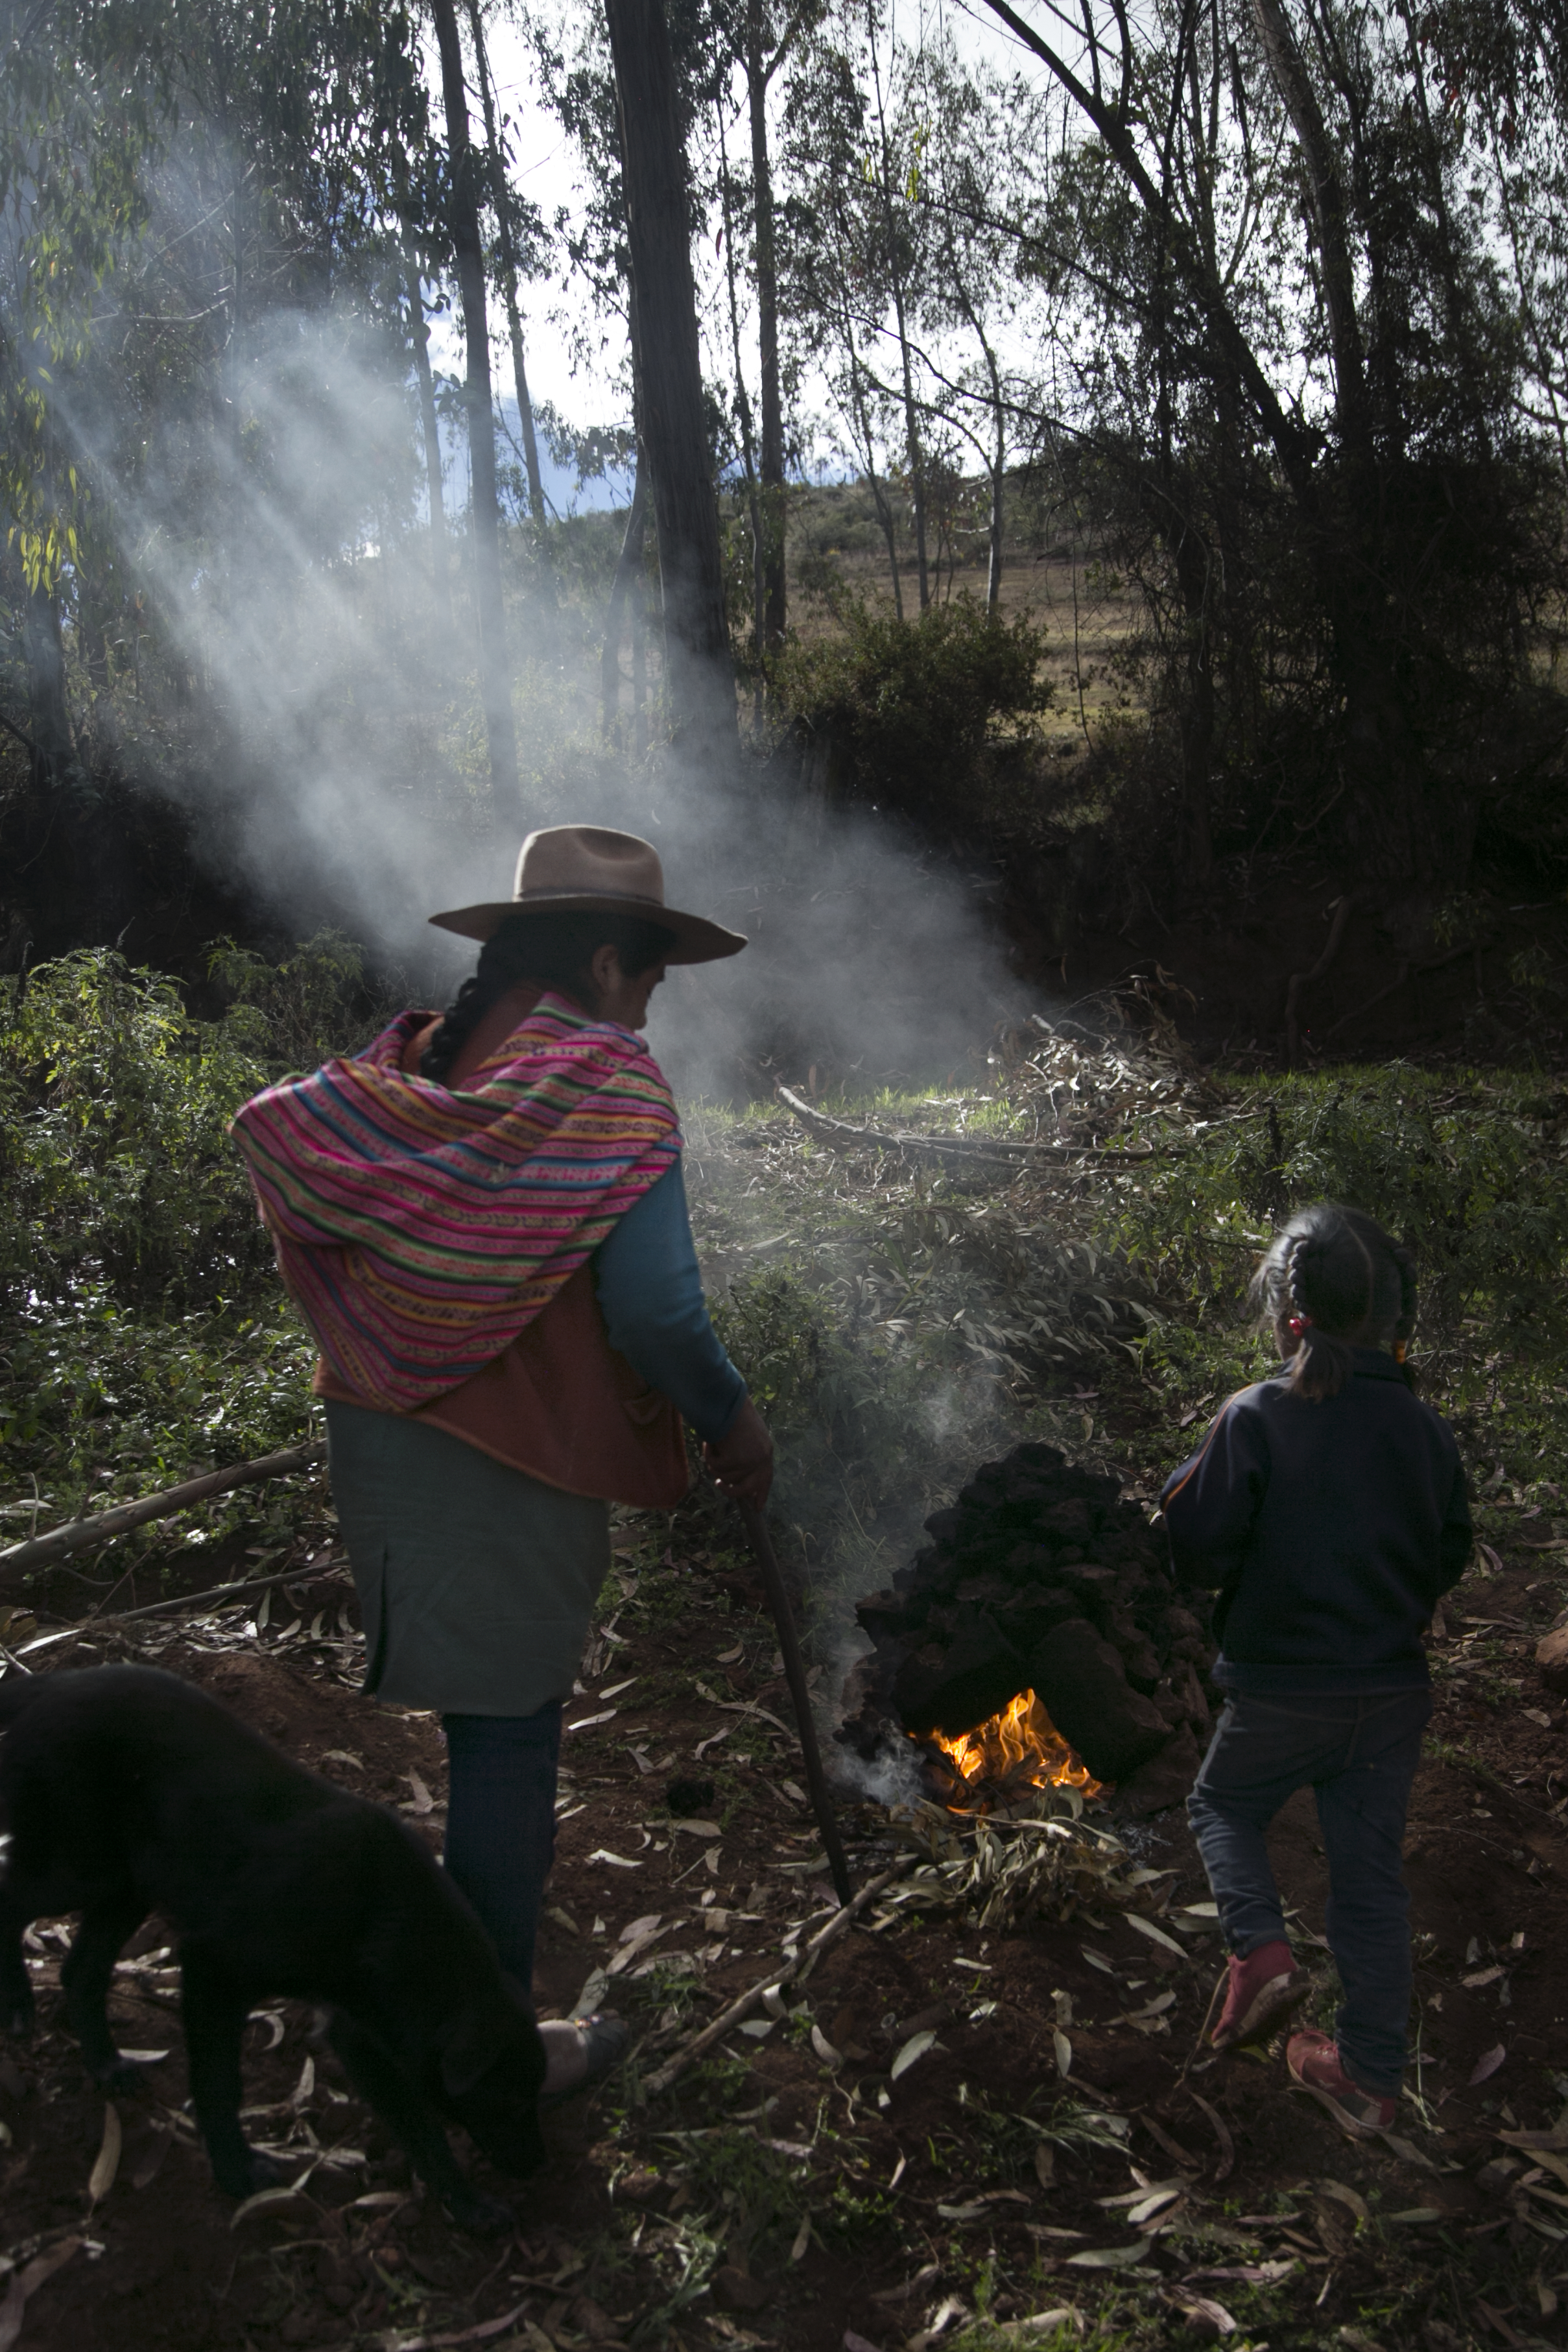 Claudia Carihuan tends a sod  huatia  oven where she will roast potatoes and fava beans.